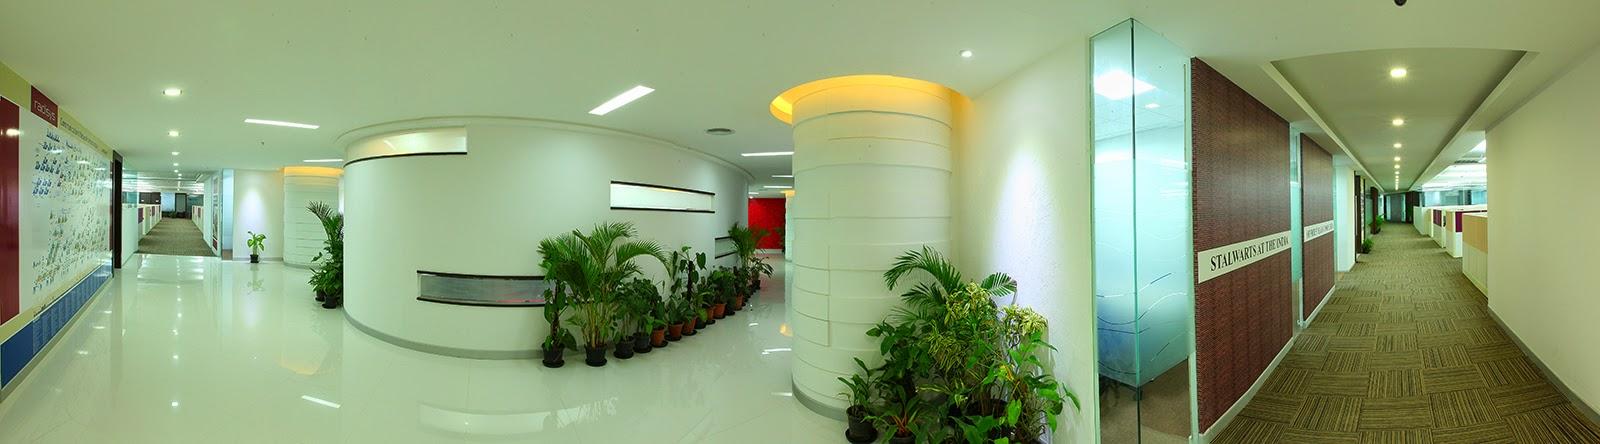 hdr panoramic interior images